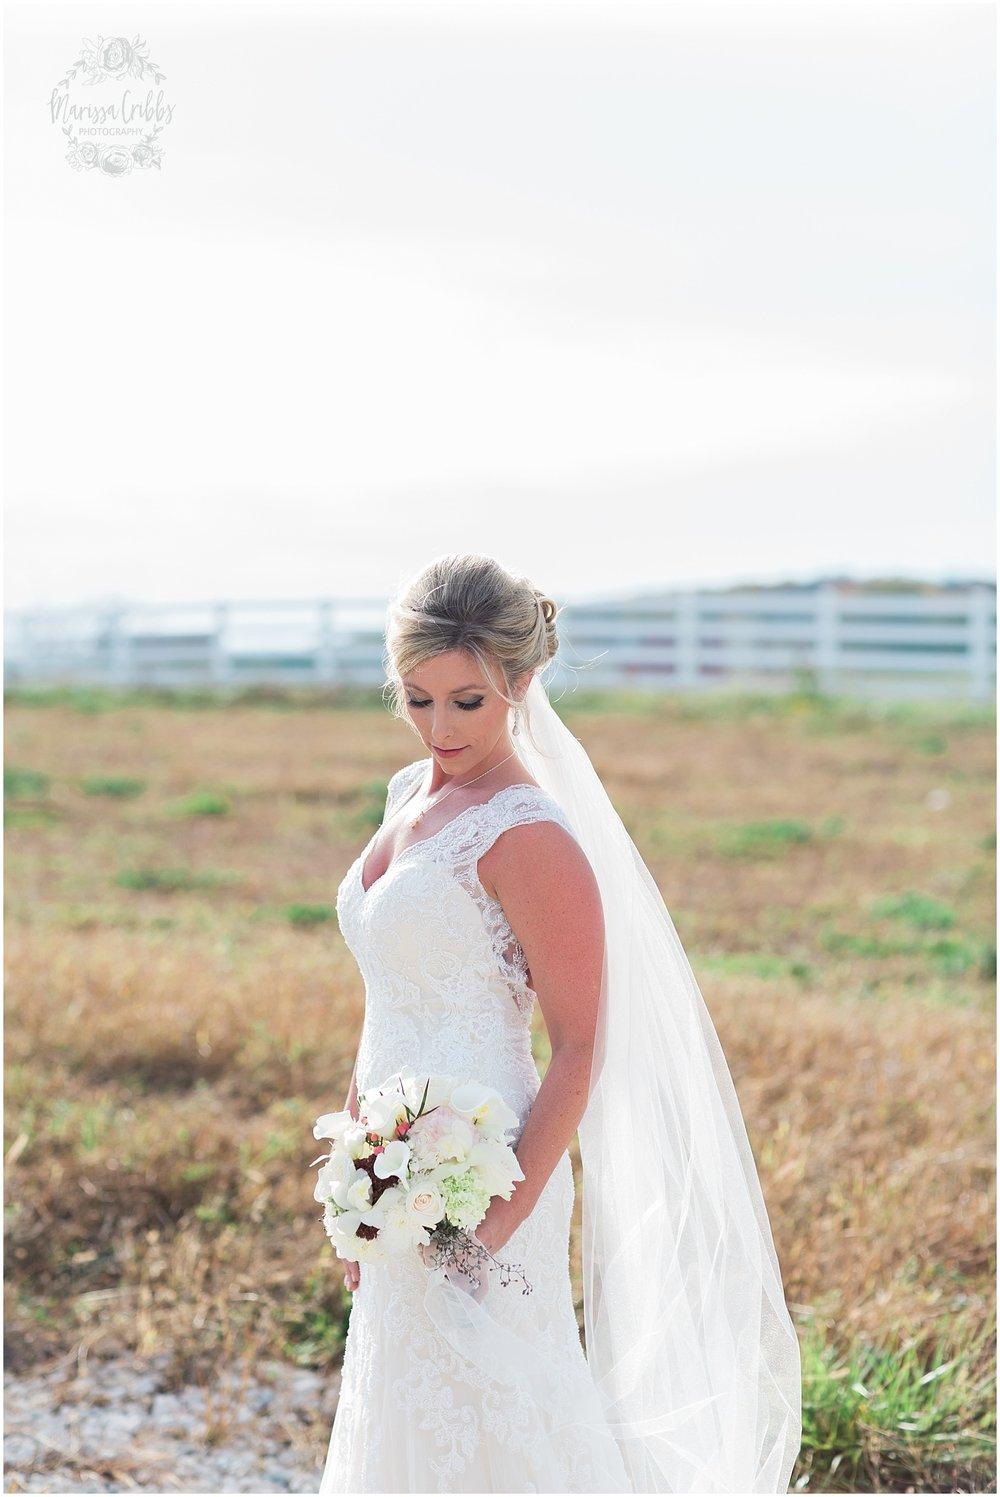 Alex & Amie | Eighteen Ninety Event Space | Marissa Cribbs Photography | Kansas City Perfect Wedding Guide_1284.jpg